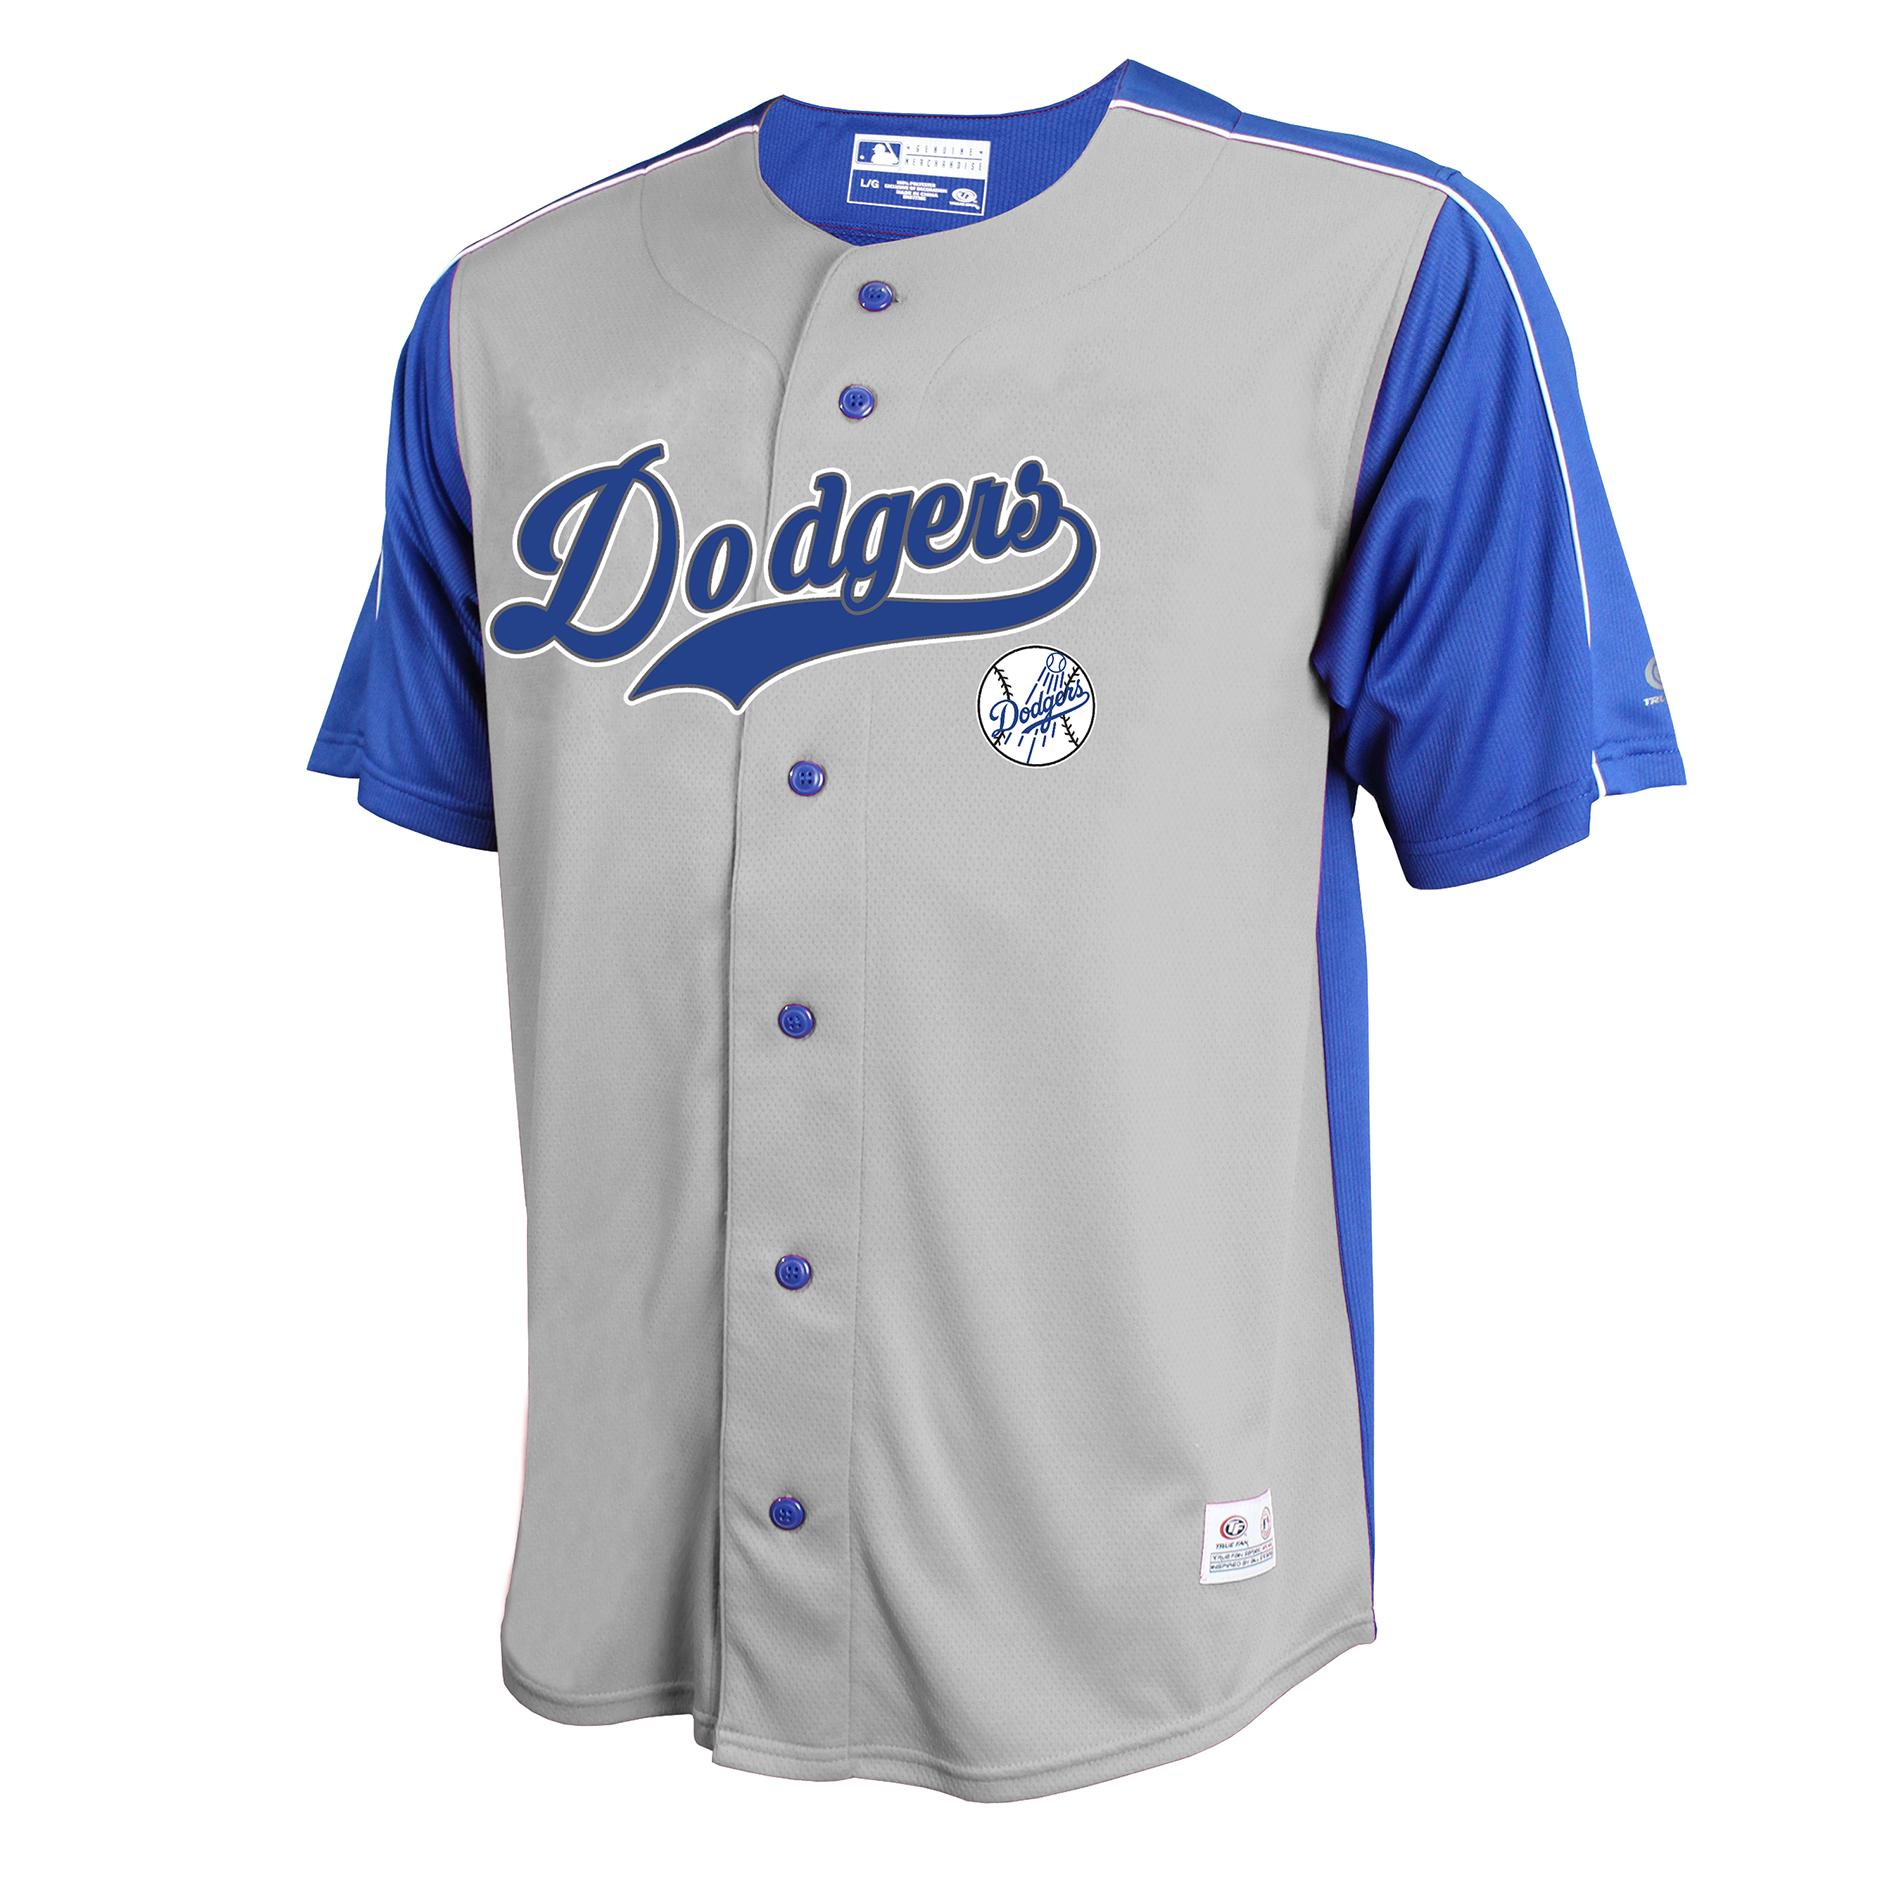 MLB Men's Baseball Jersey - Los Angeles Dodgers